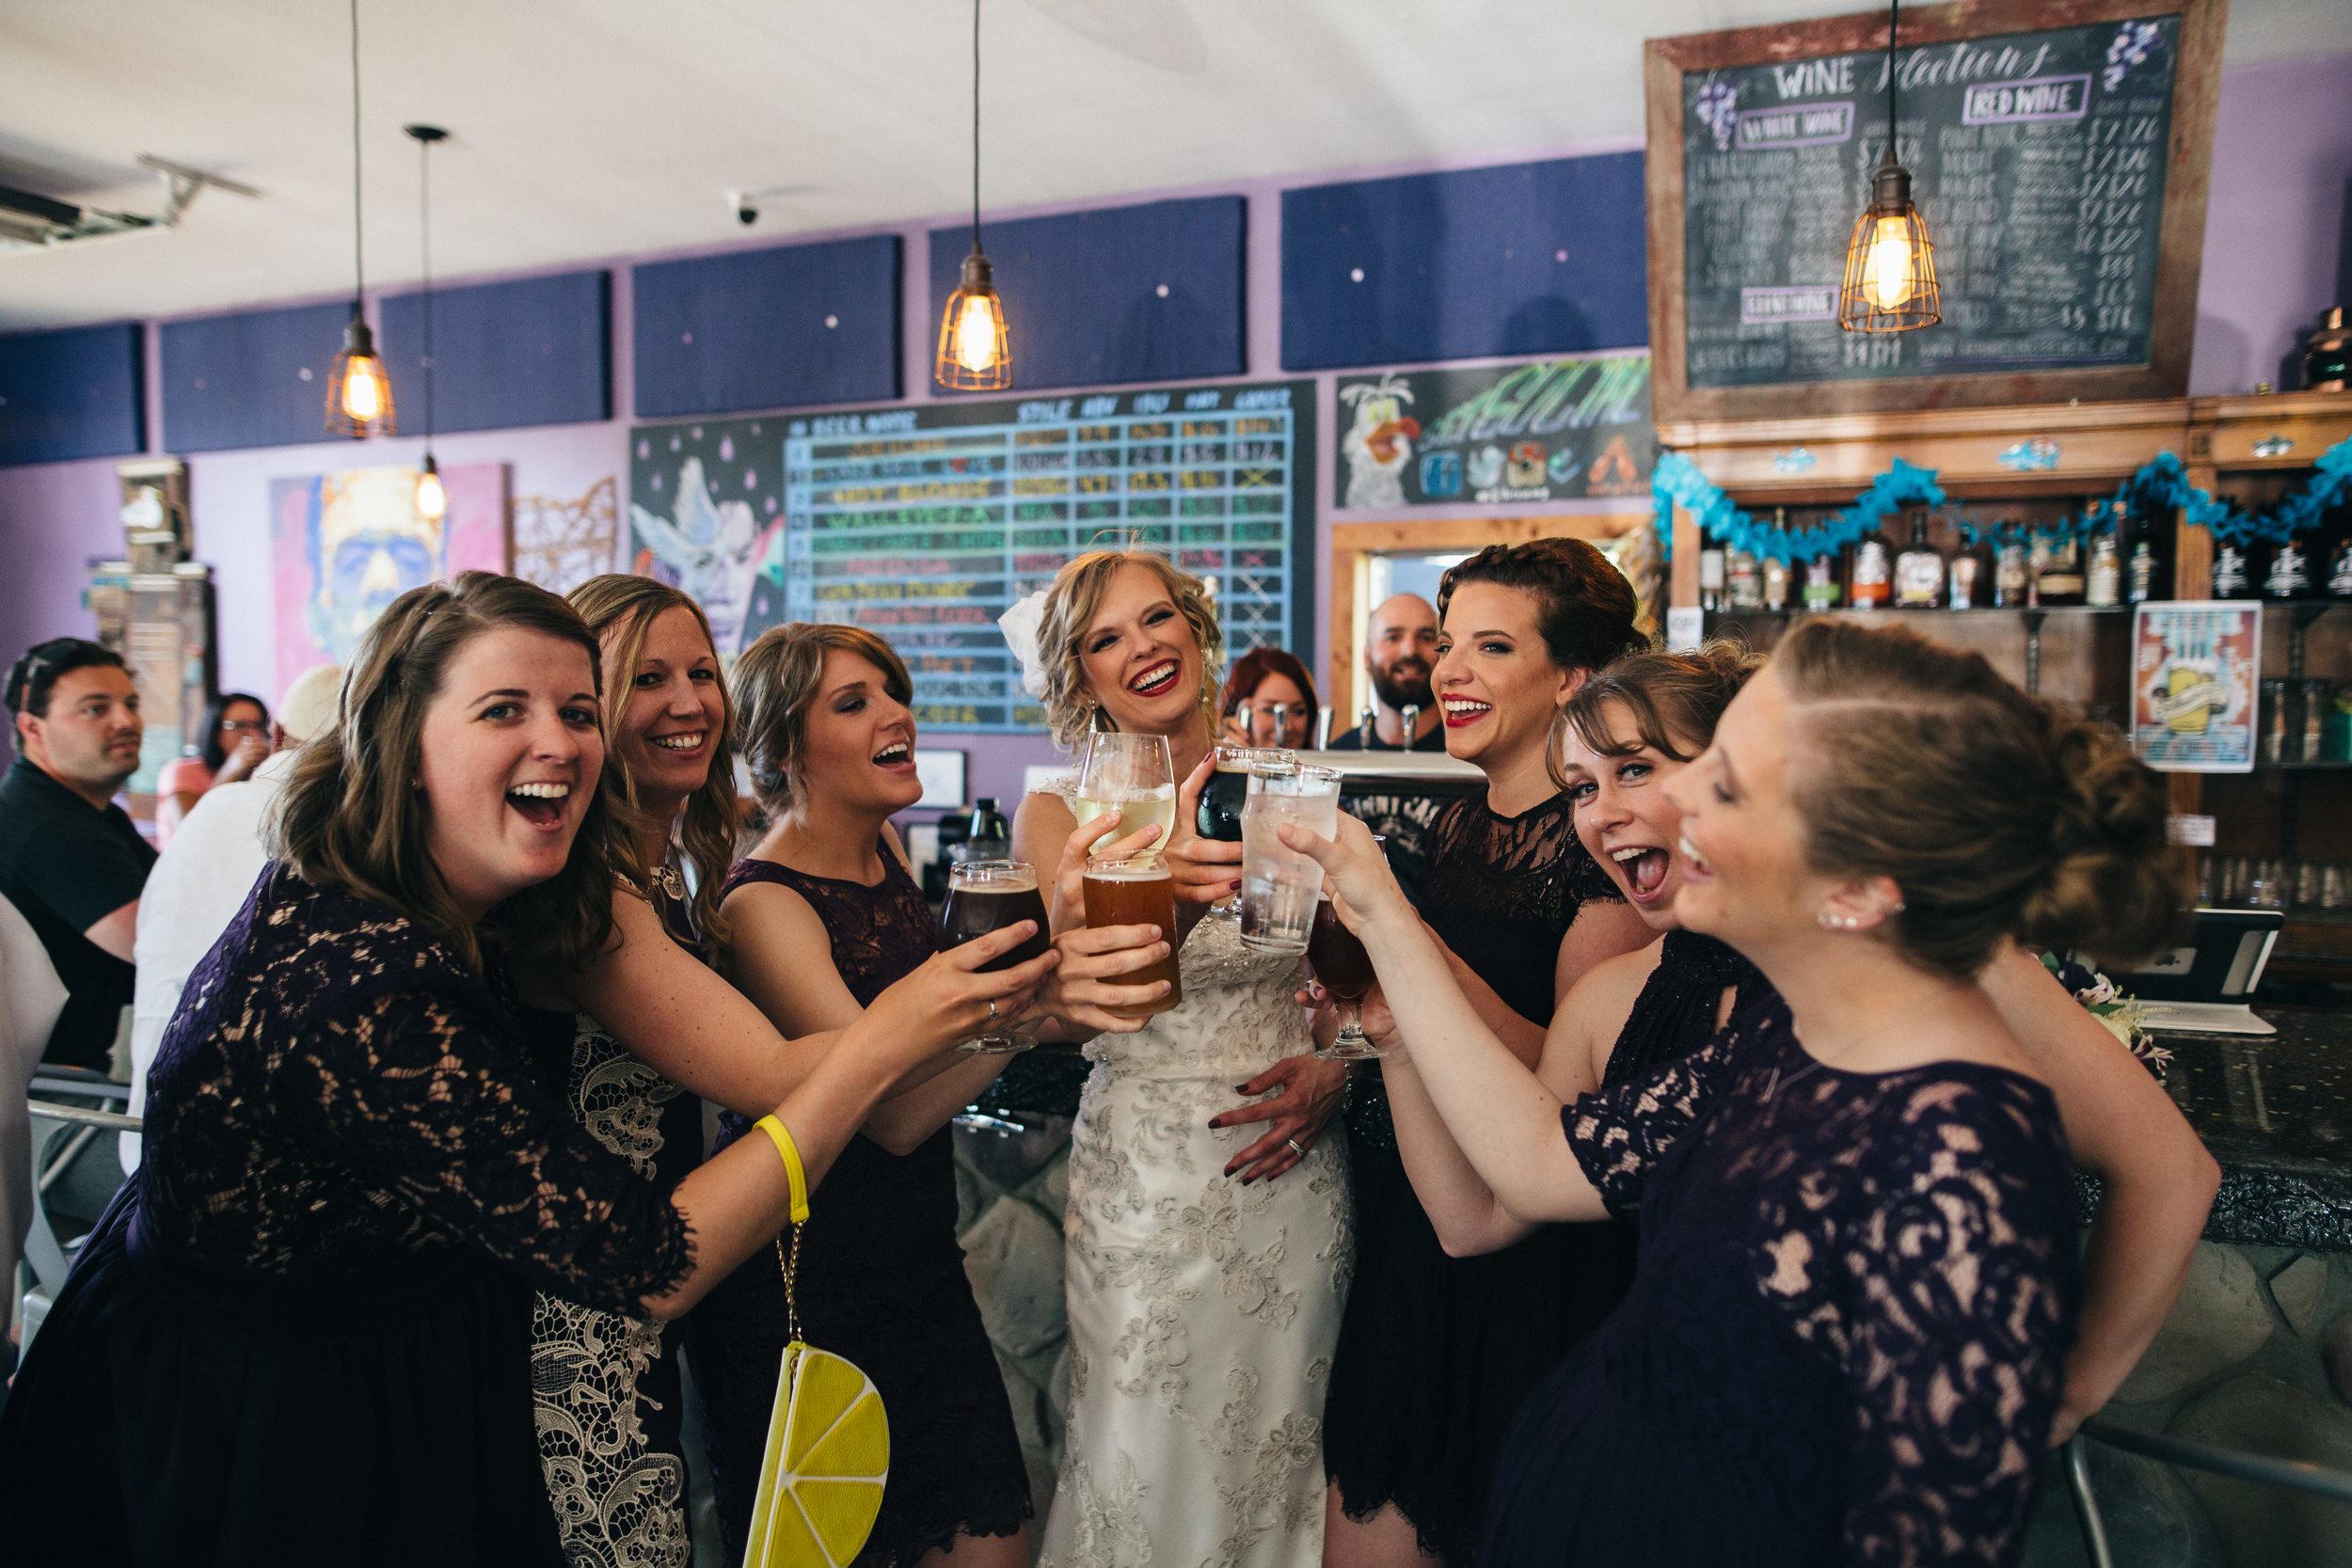 Bridesmaids at Catawba Island Brewery in Catawba Island, Ohio.